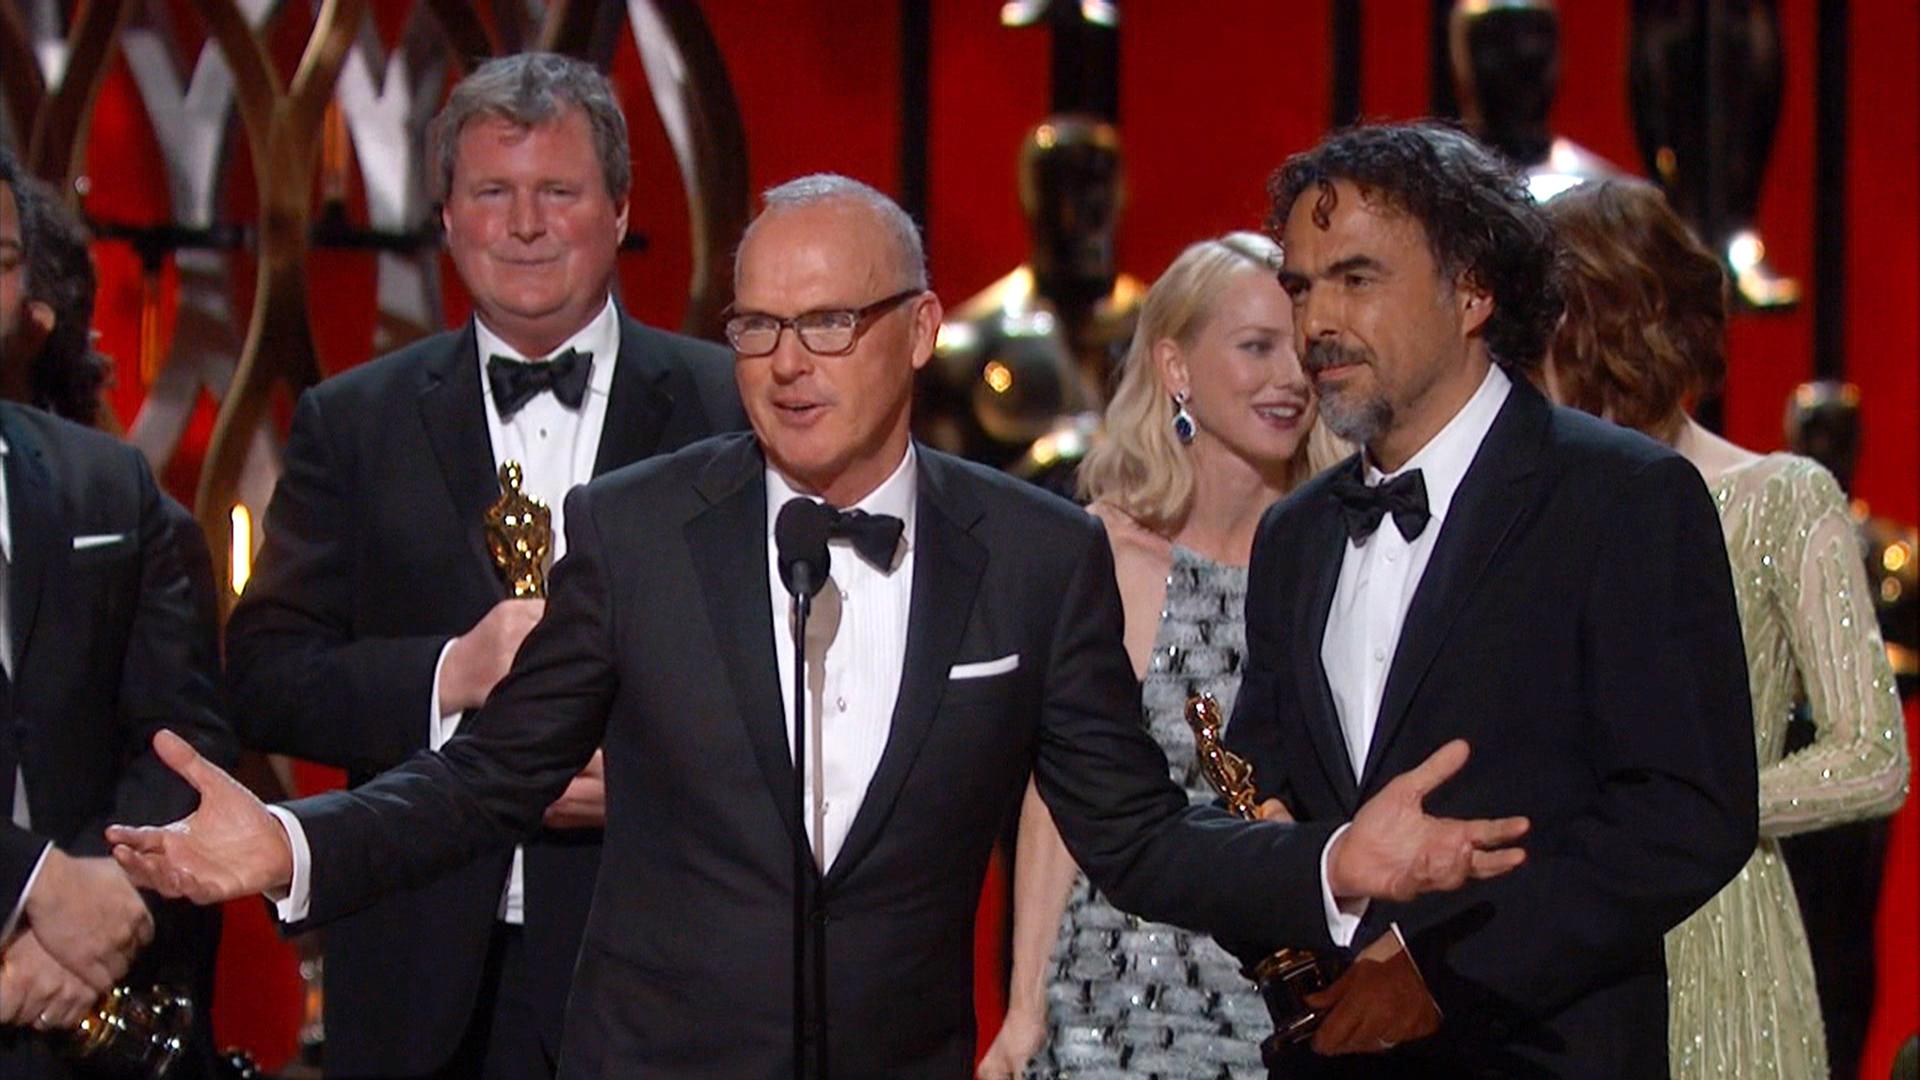 Oscars 2015: 'Birdman' Soars on Hollywood's Biggest Night